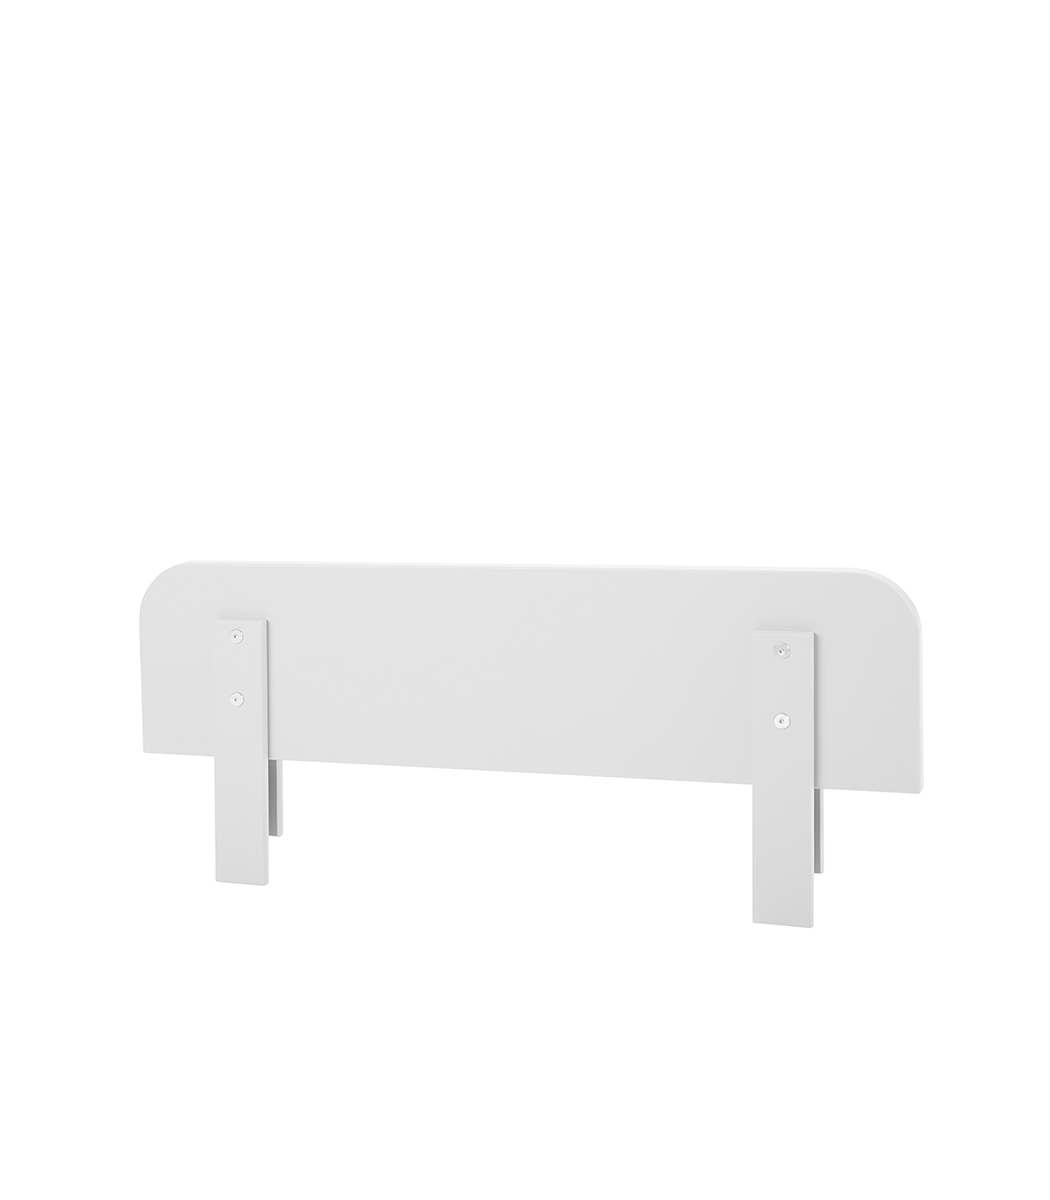 Pinio Calmo - barierka do łóżka 140x70 i 200x90